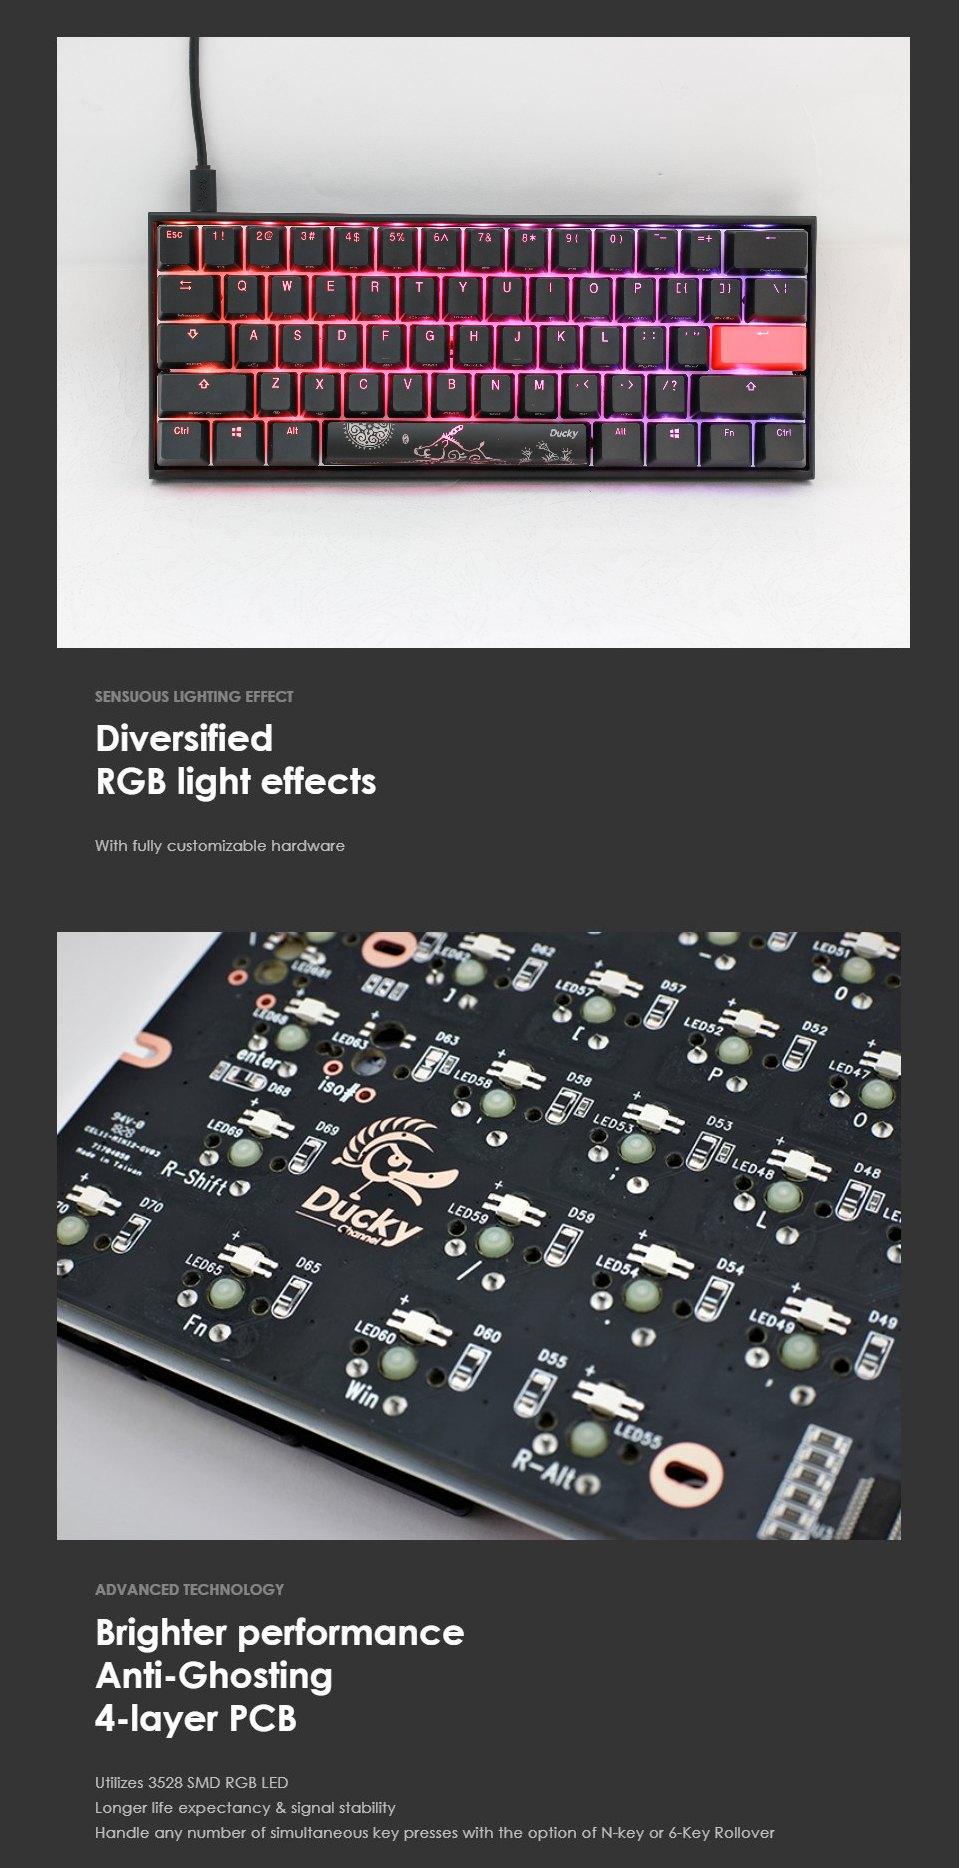 Ducky One 2 Mecha Mini RGB Mechanical Keyboard Blue features 3